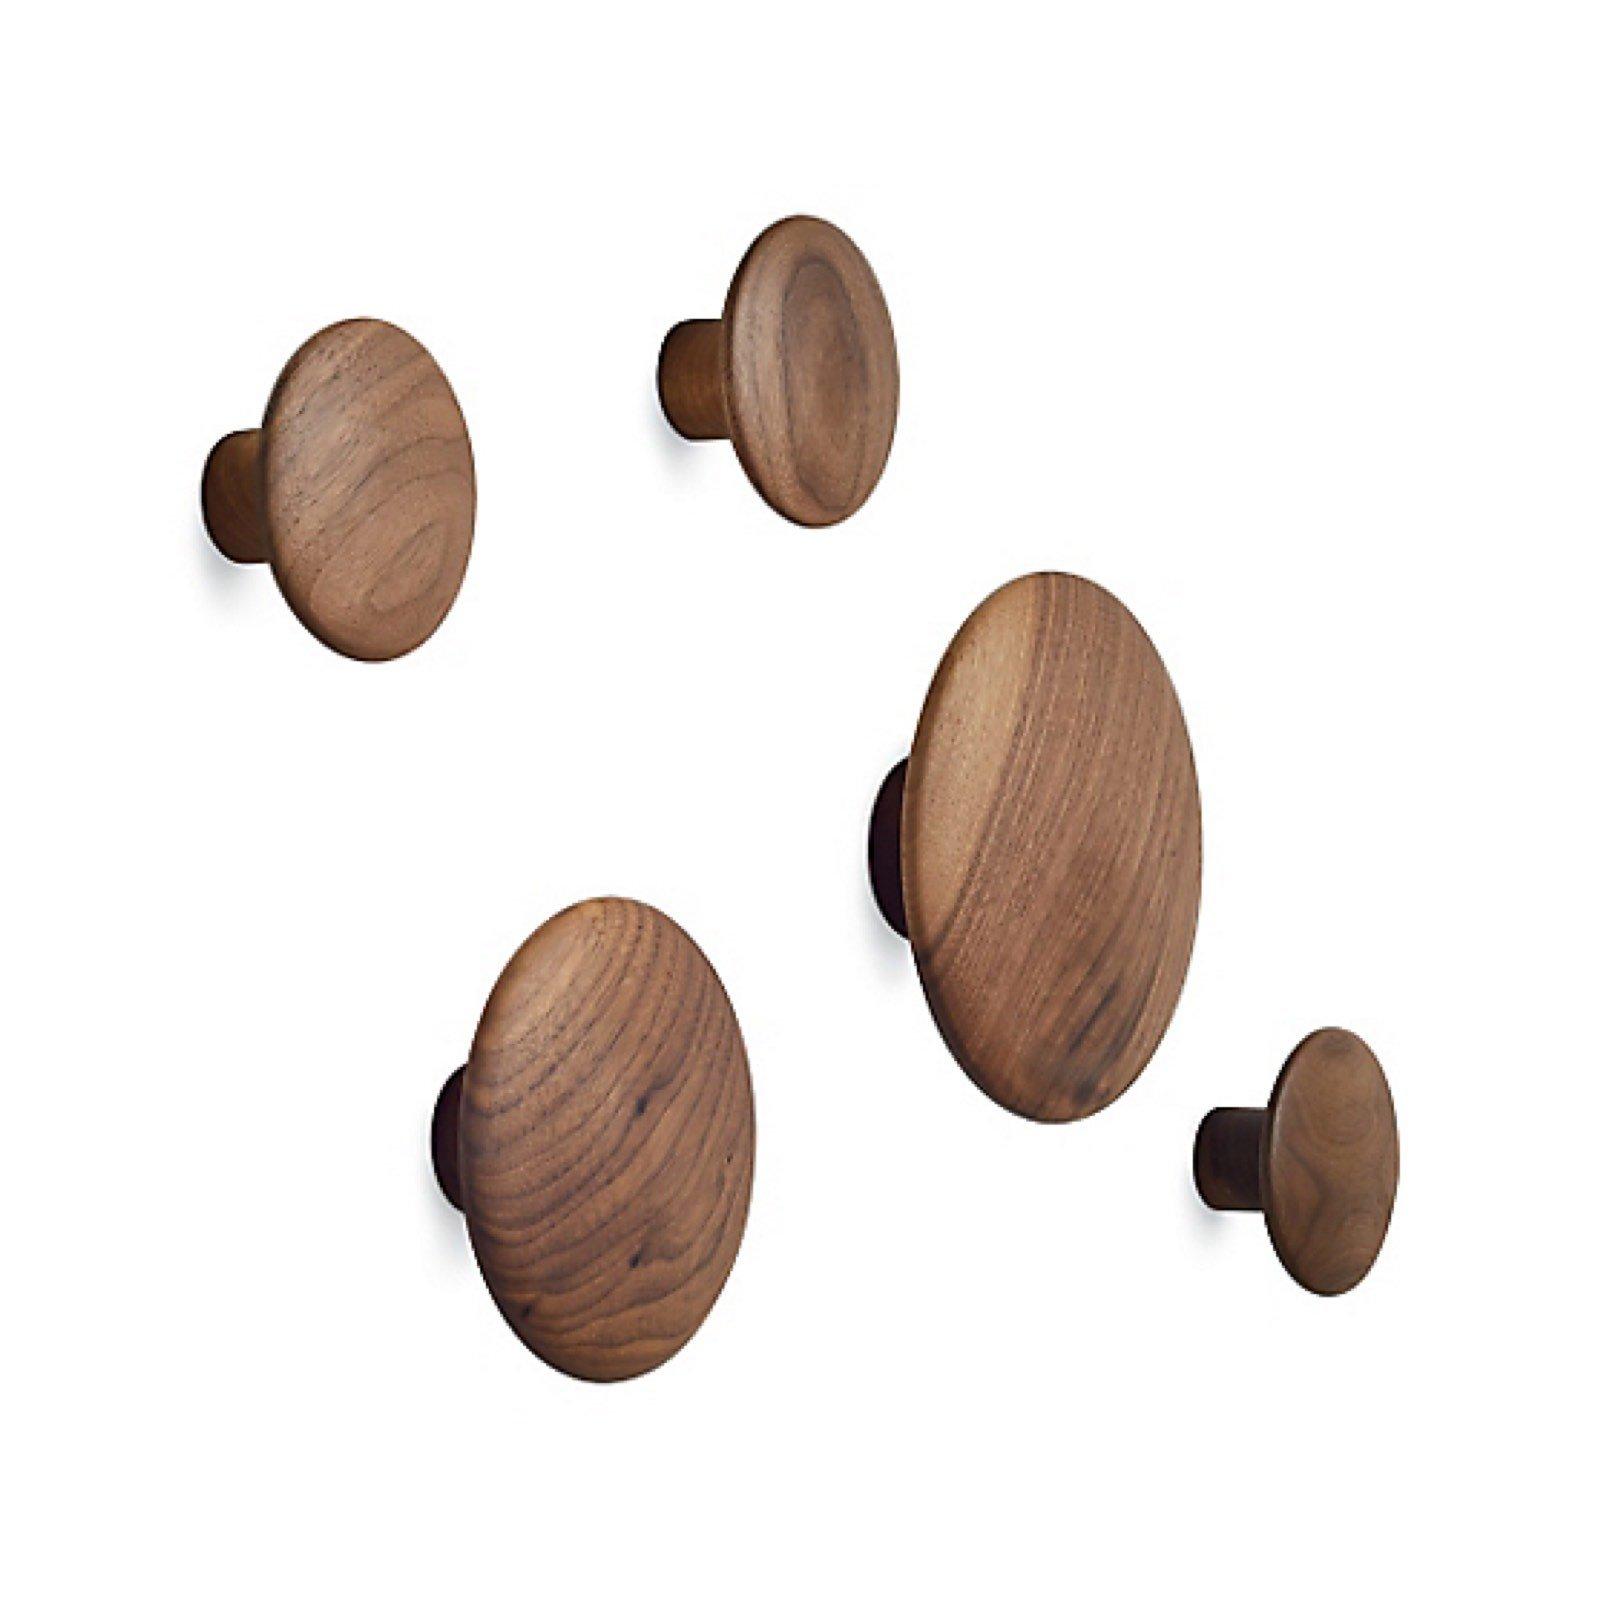 Muuto Set of 5 Wood Coatrack Dots